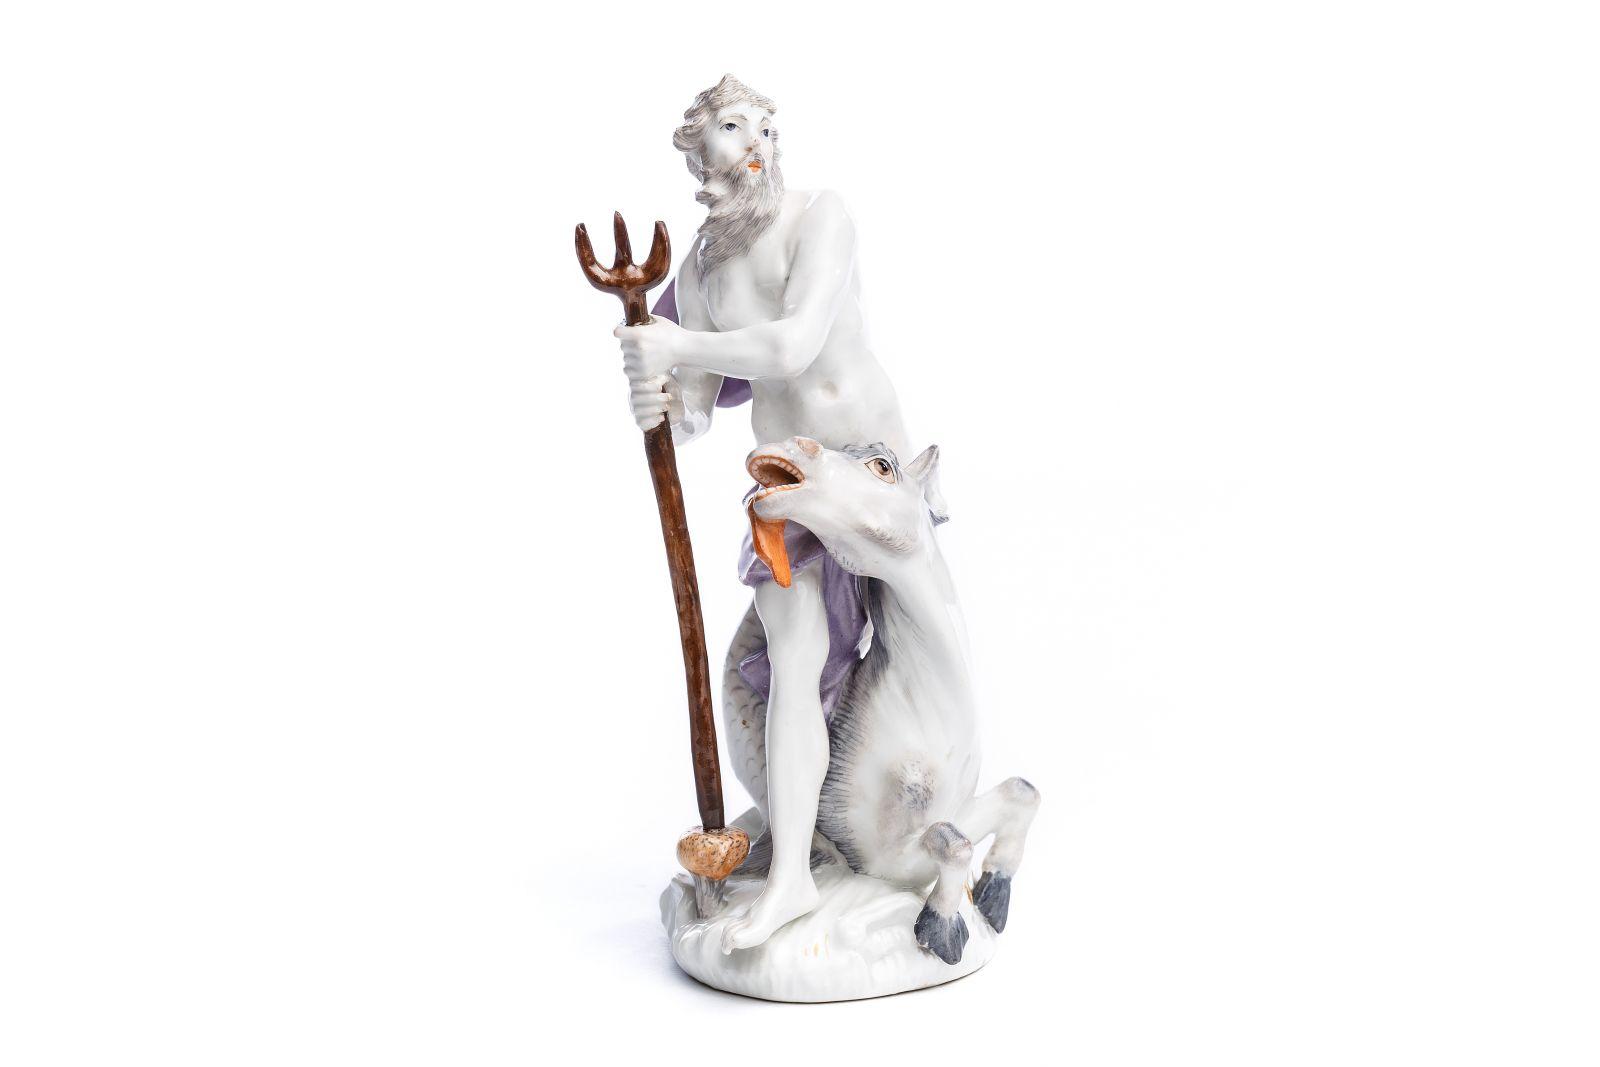 "#150 Porcelain figure ""Poseidon and Hippocampus"", Meissen 1755 | Porzellanfigur ""Poseidon und Hippocampus"", Meissen 1755 Image"